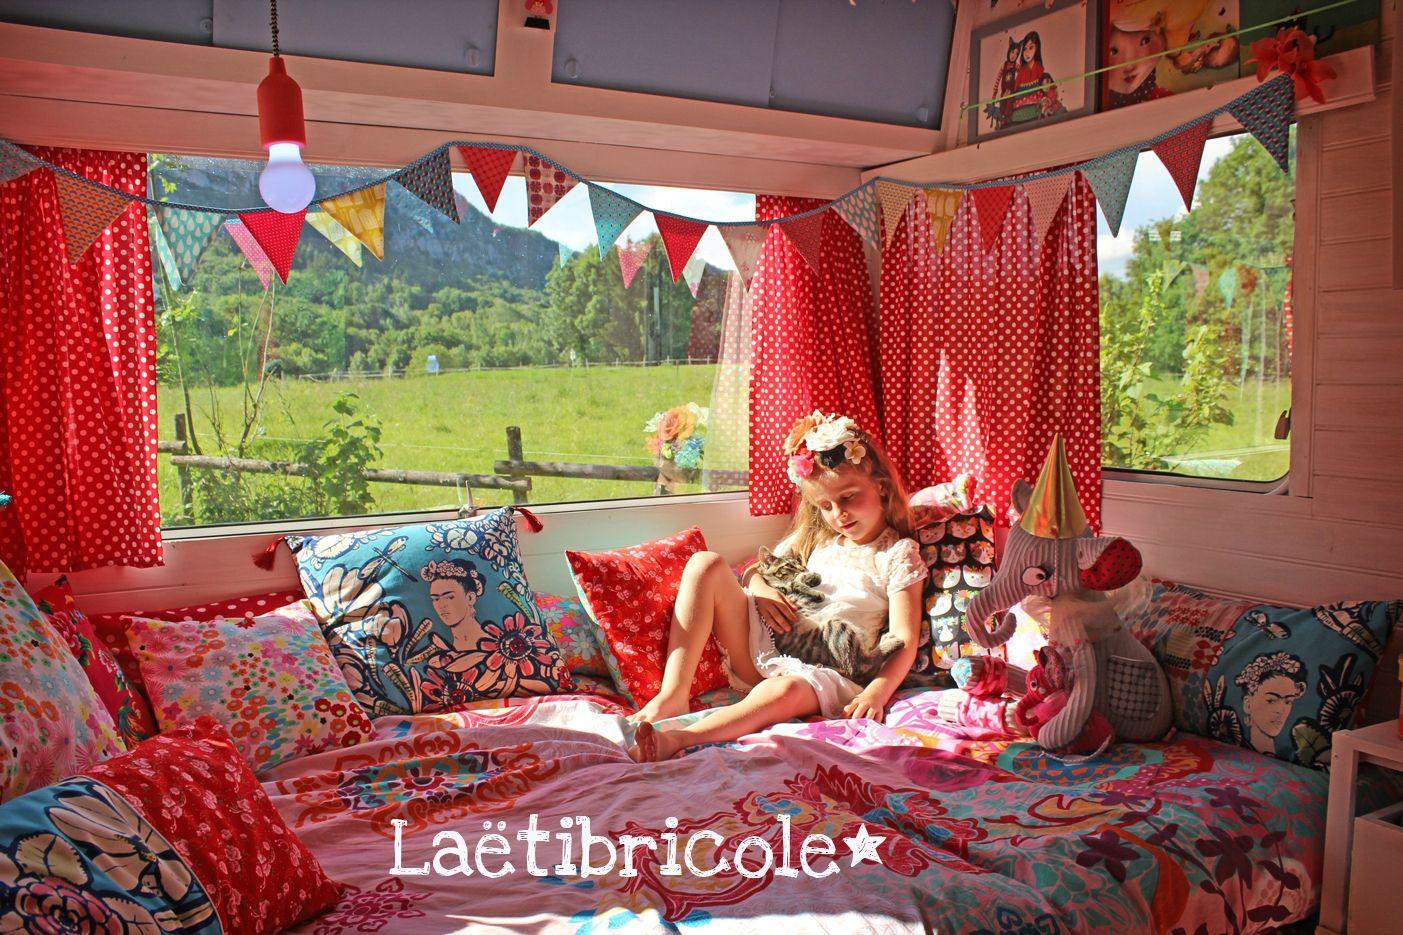 la vie de boh me laetibricole my girls bedroom pinterest caravane laetibricole et. Black Bedroom Furniture Sets. Home Design Ideas